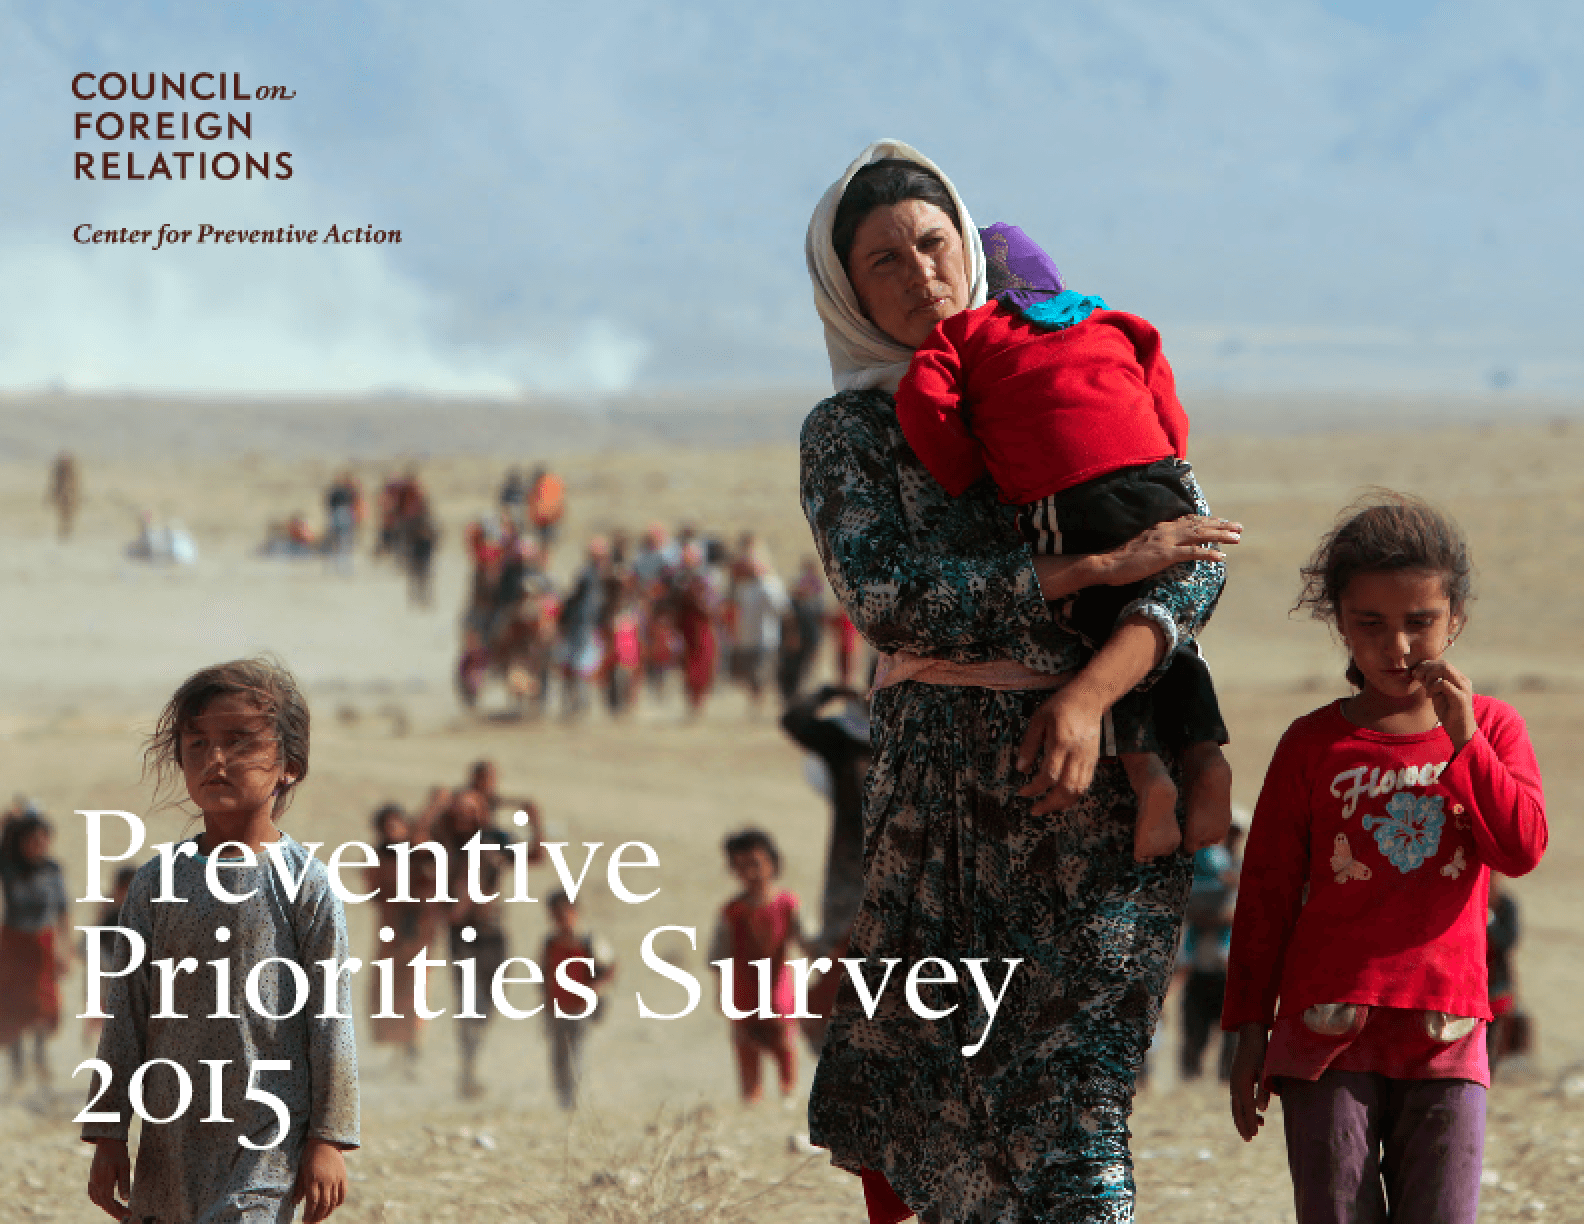 Preventive Priorities Survey 2015